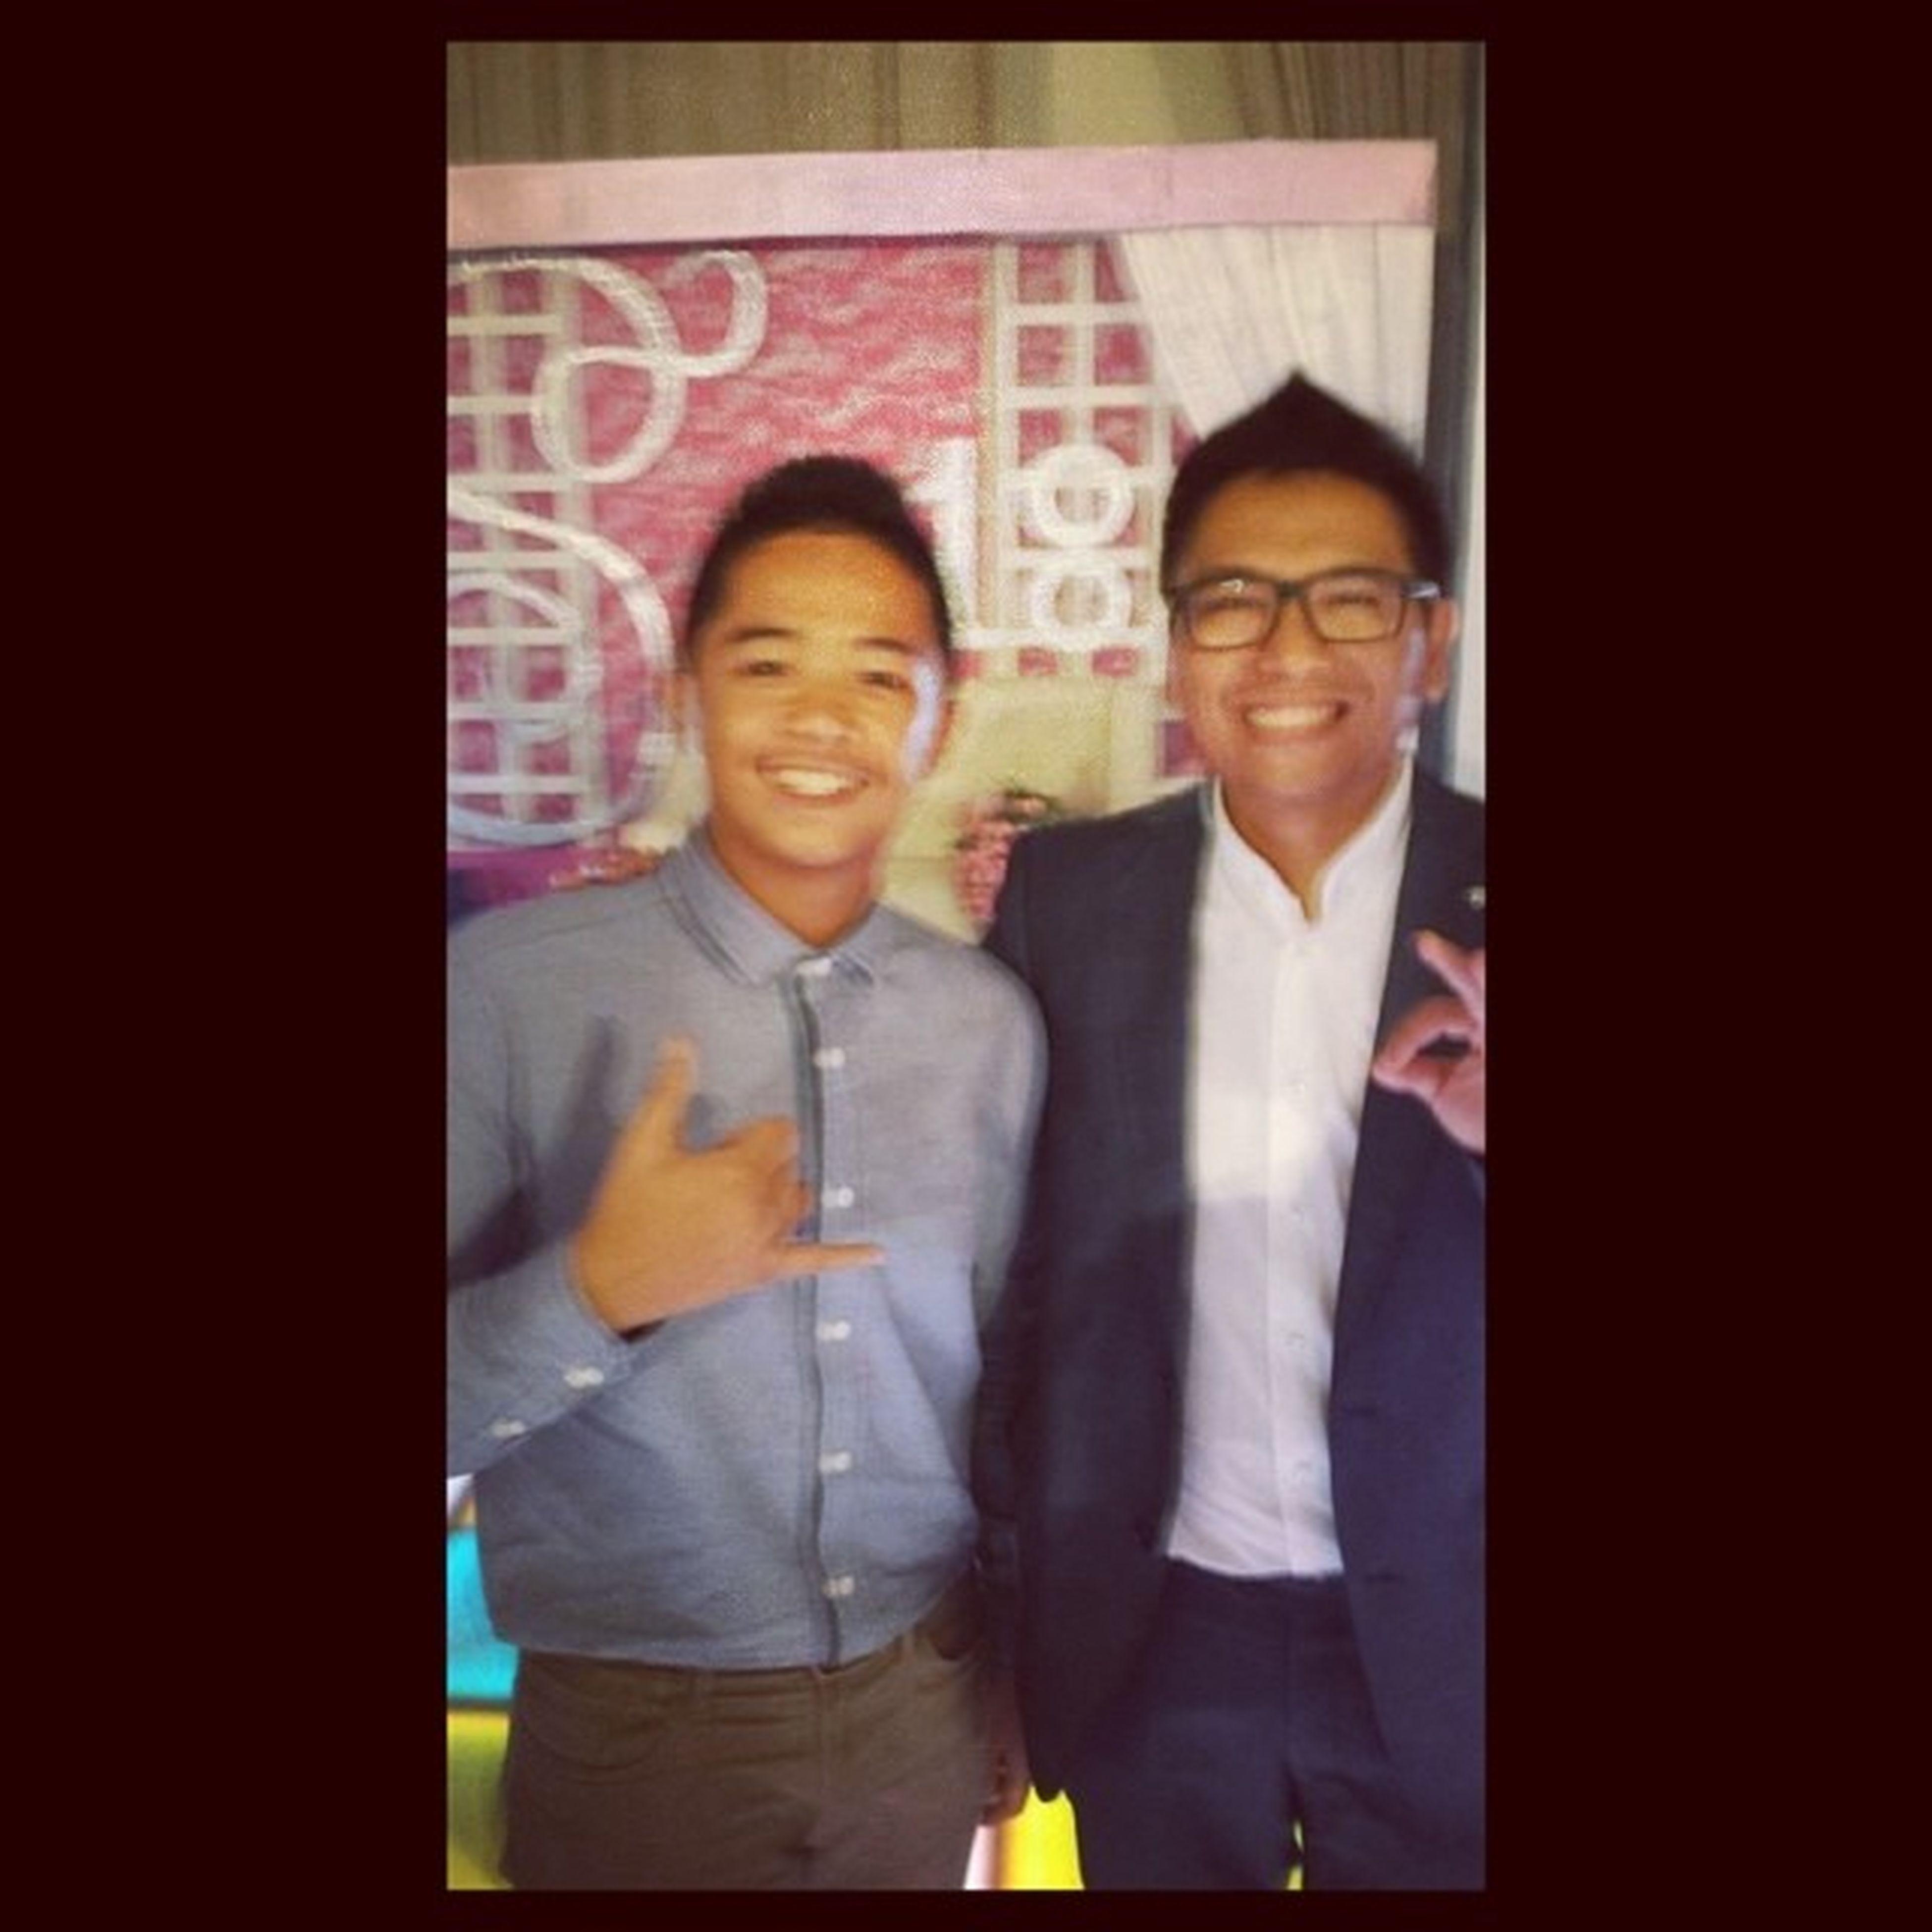 With @_slickrick ??? Yeahmeeeen BNO SophiaAt18 Labongpic